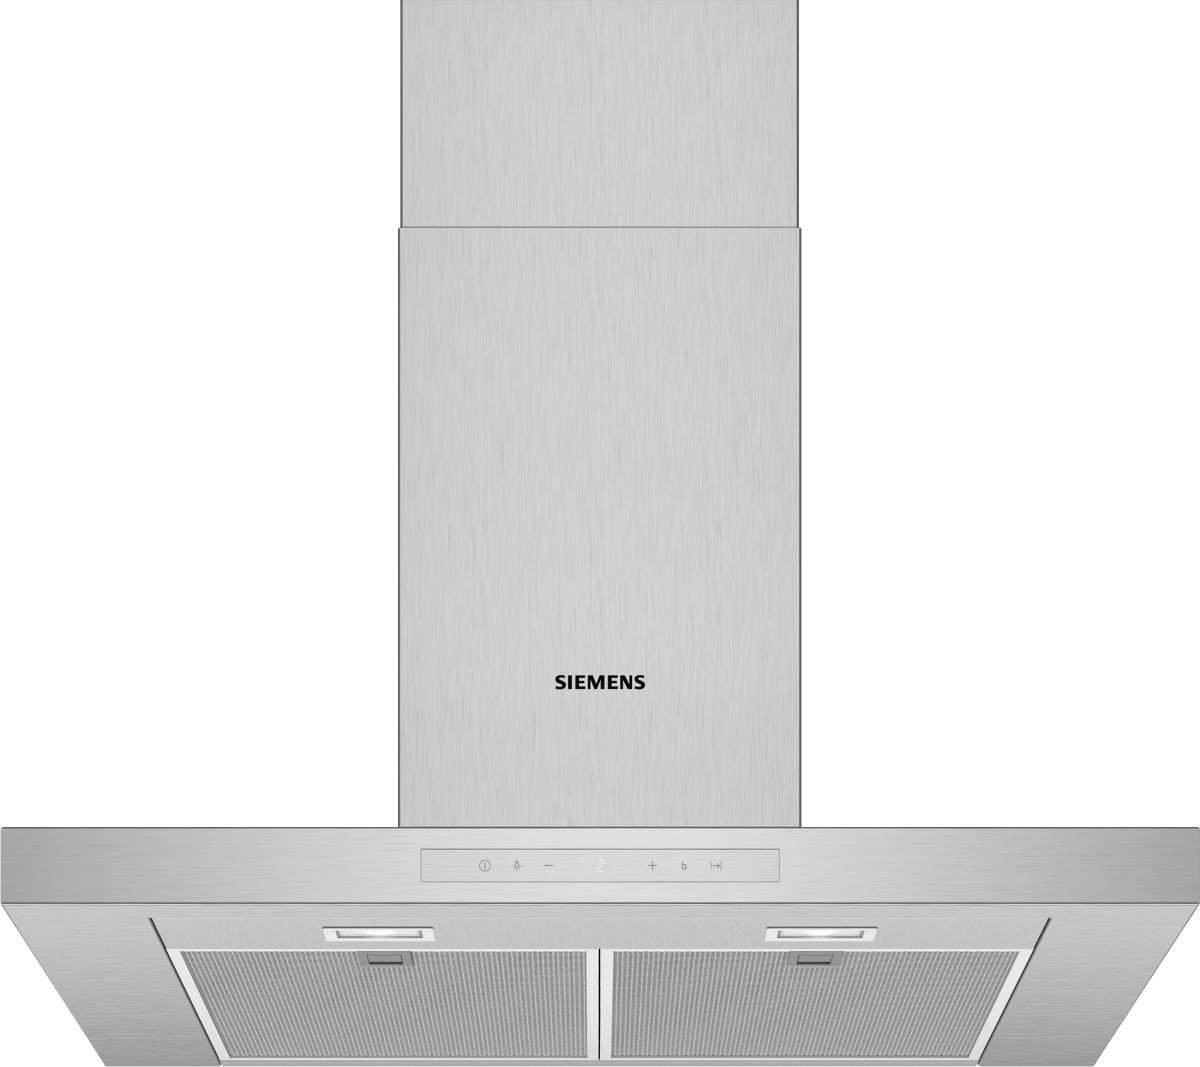 Siemens LC77BCP50Wandhaube 70cm breit